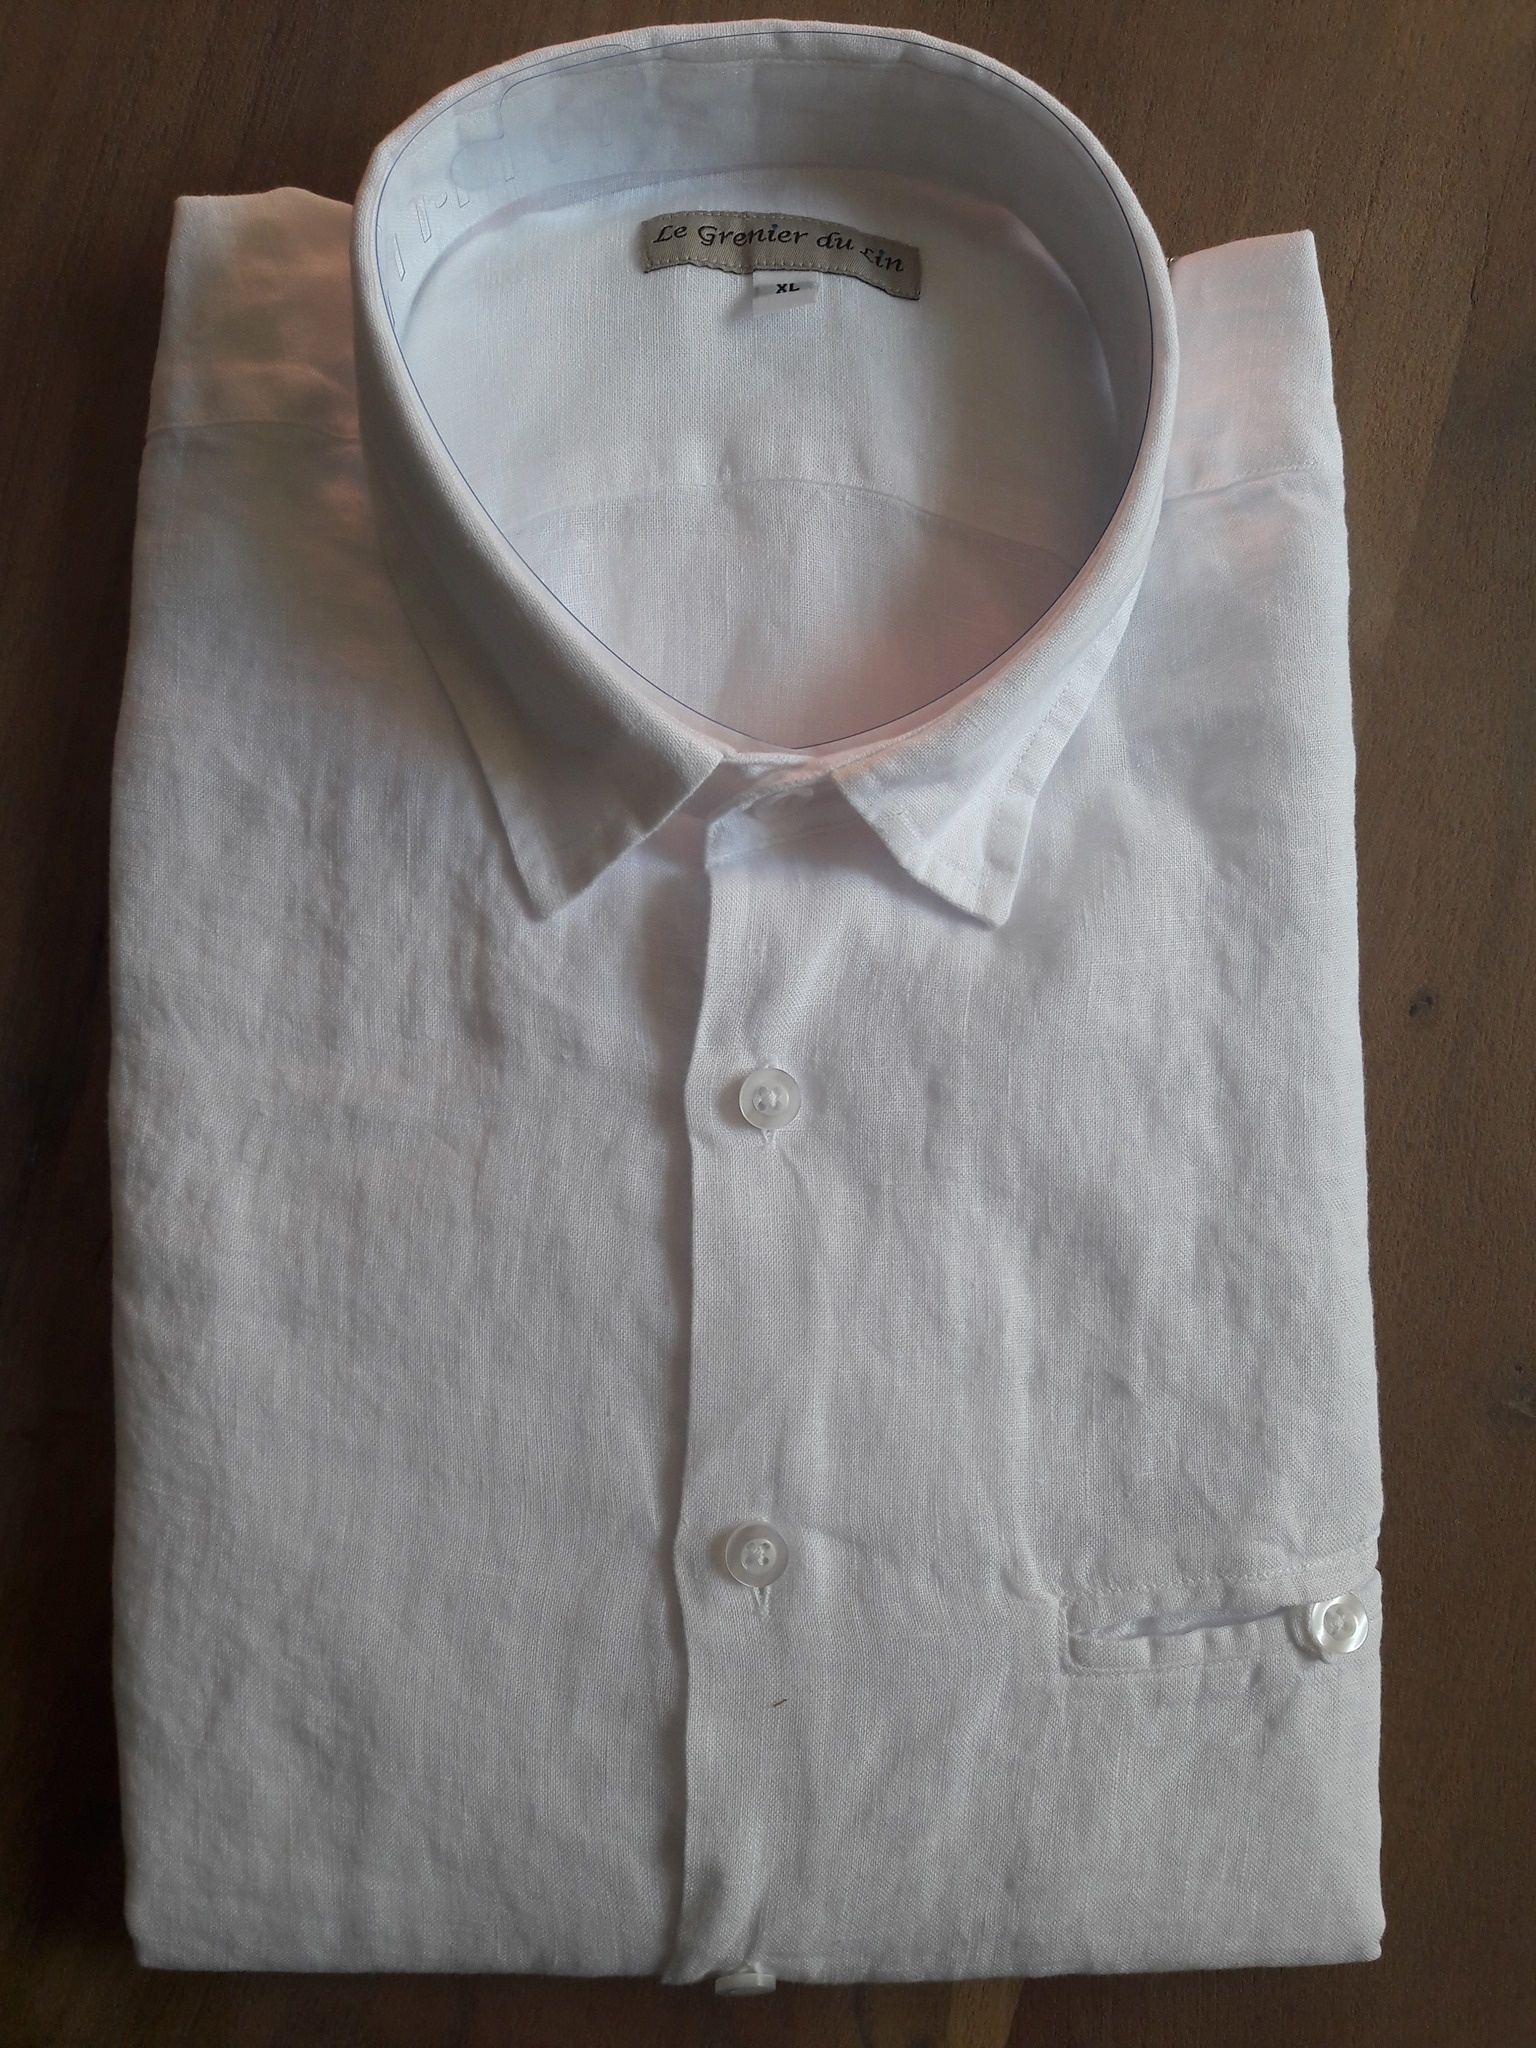 Le grenier du lin Wit Wood slim fit linnen overhemd